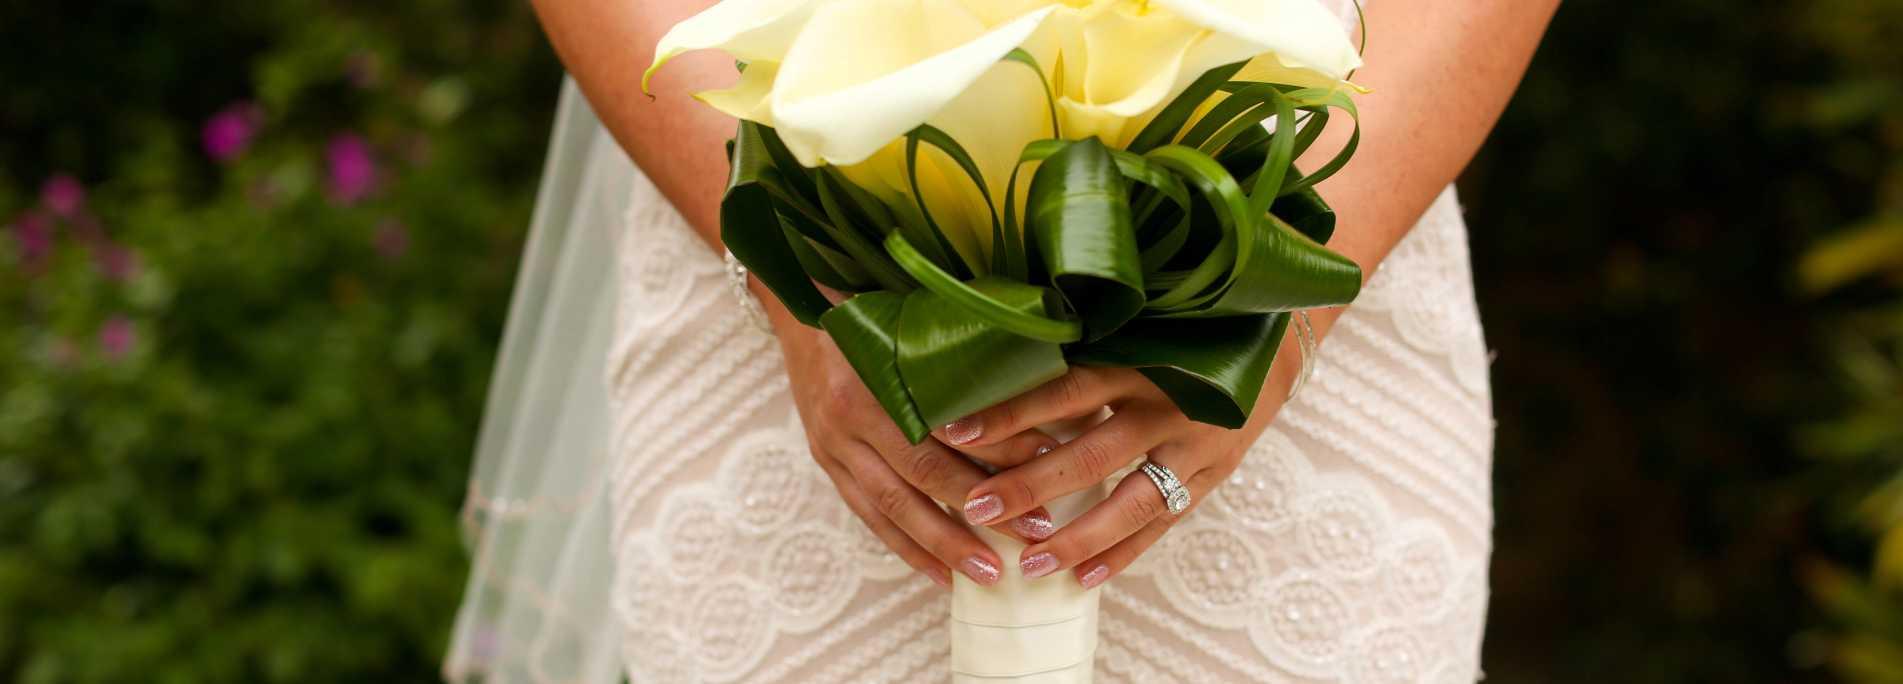 Wedding Planners & Officiants | Catalina Island